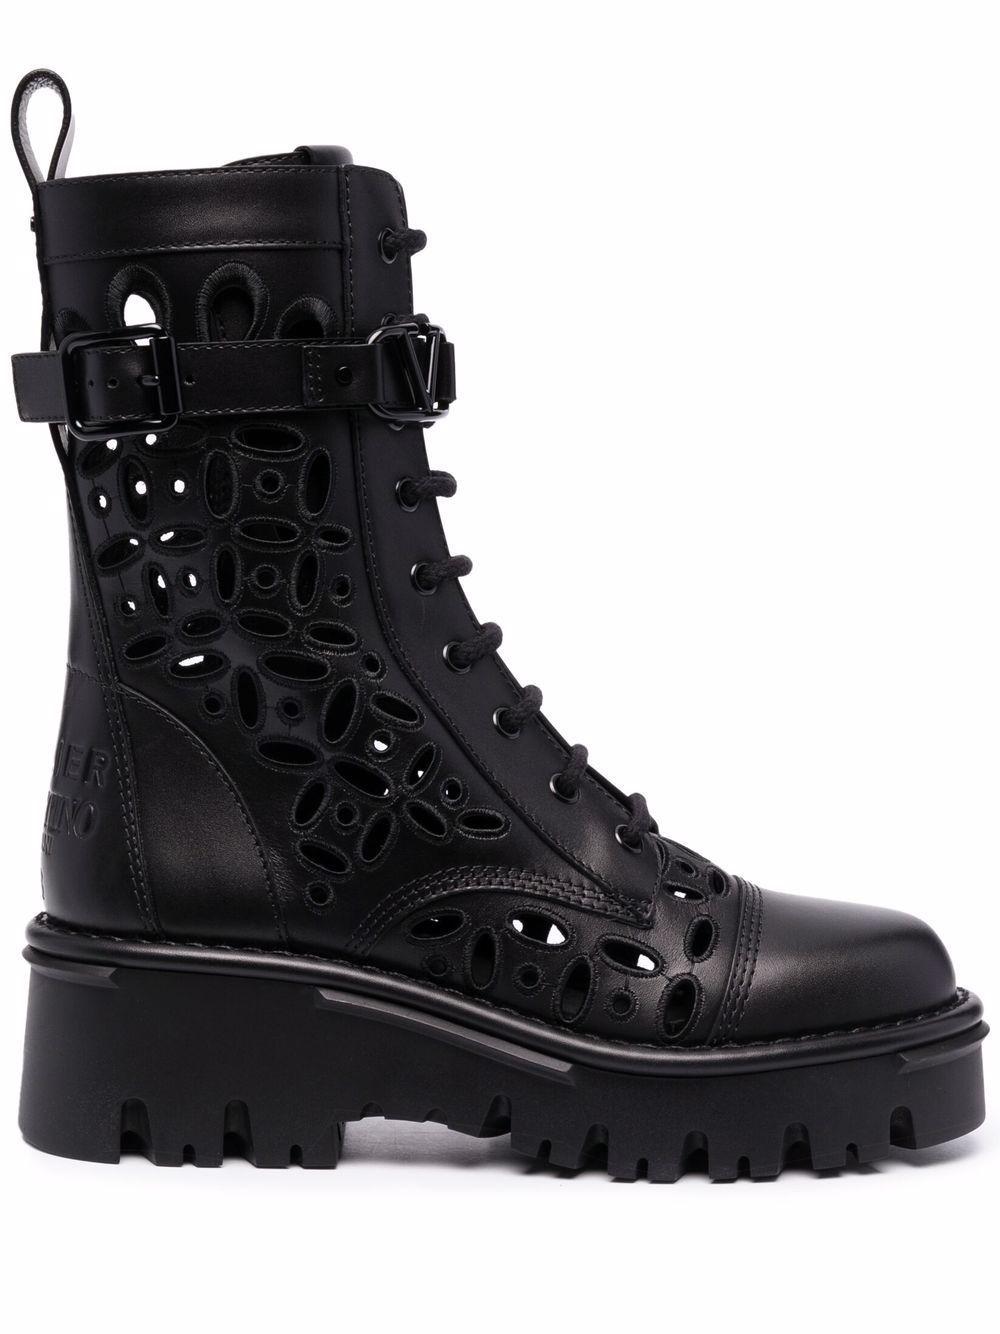 Atelier sangallo etidion combat boots